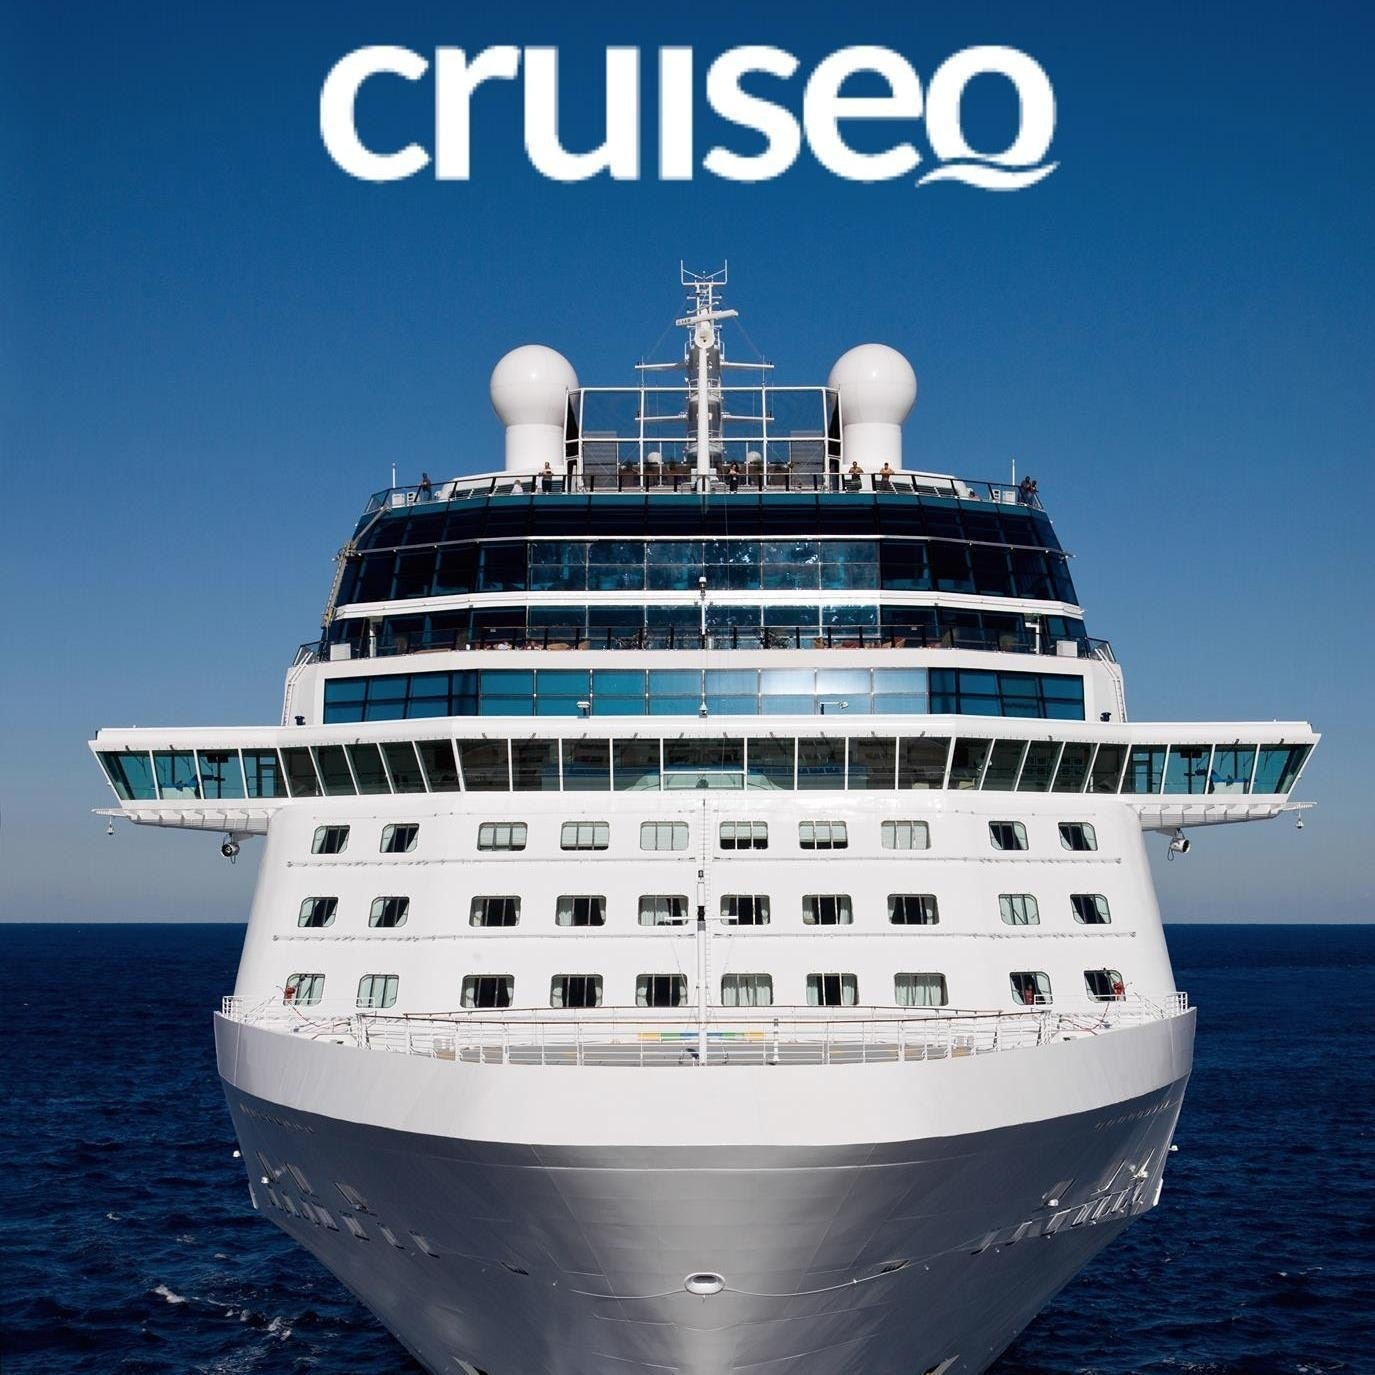 Cruiseo.com